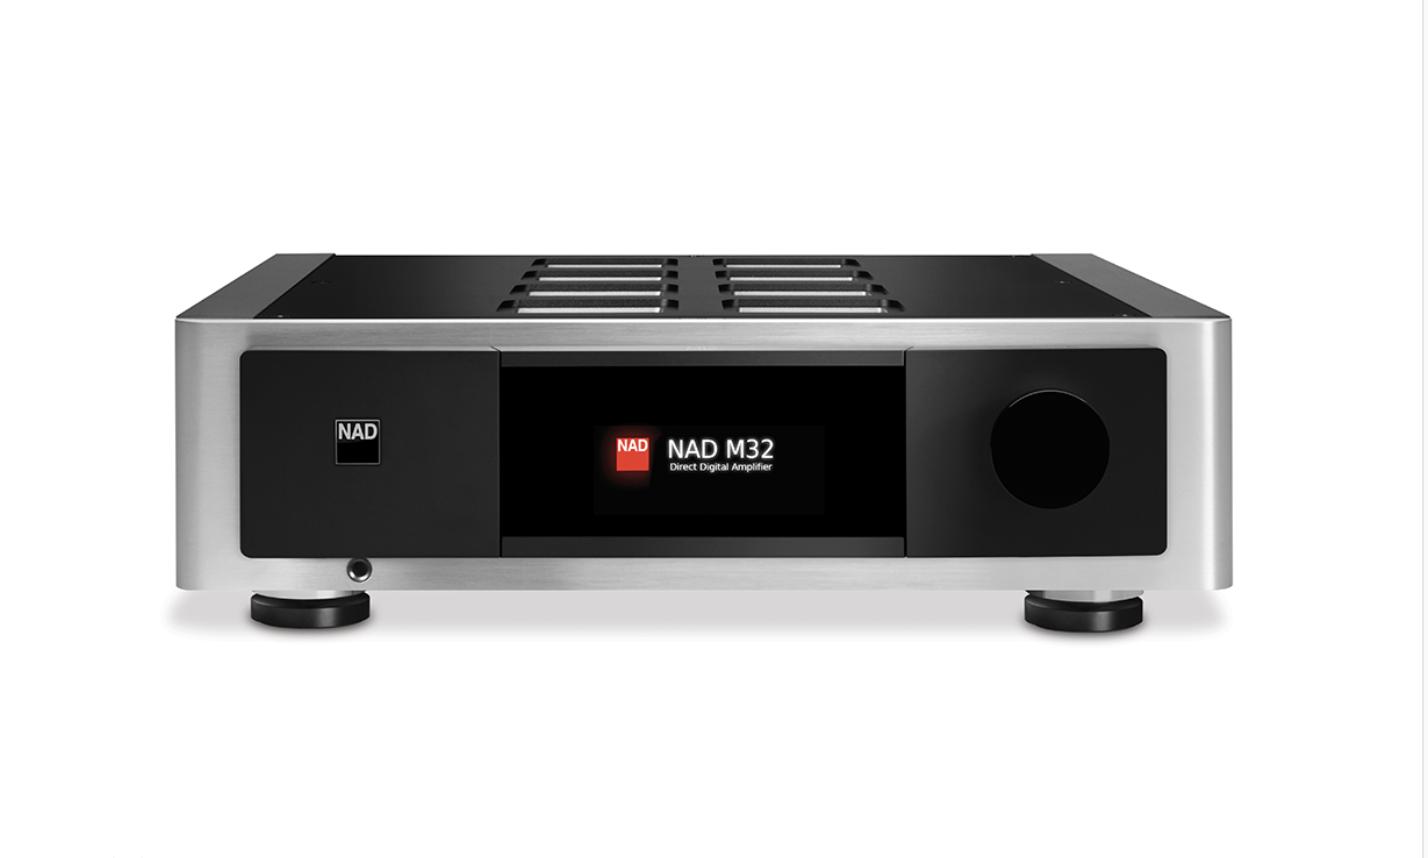 NAD M32 DirectDigital Amplifier